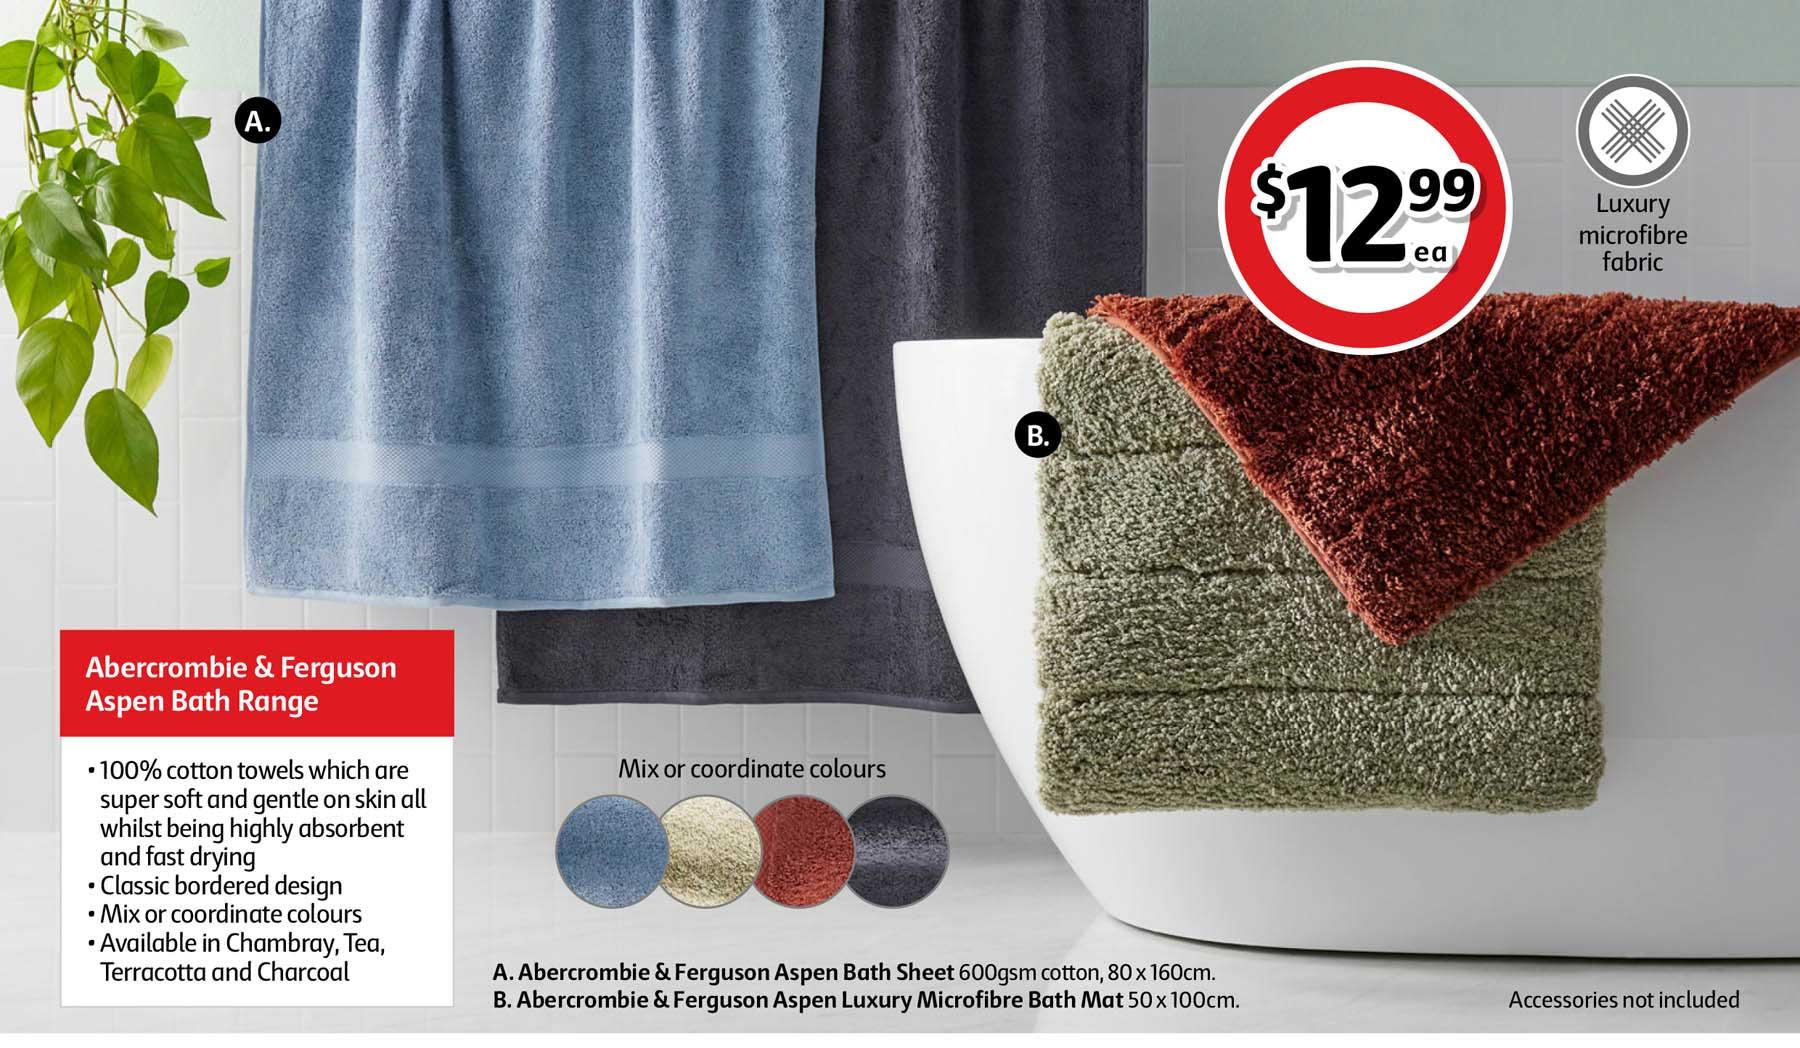 Coles Abercrombie & Ferguson Aspen Bath Sheet 80 X 160cm Or Abercrombie & Ferguson Aspen Luxury Microfibre Bath Math 50 X 100cm